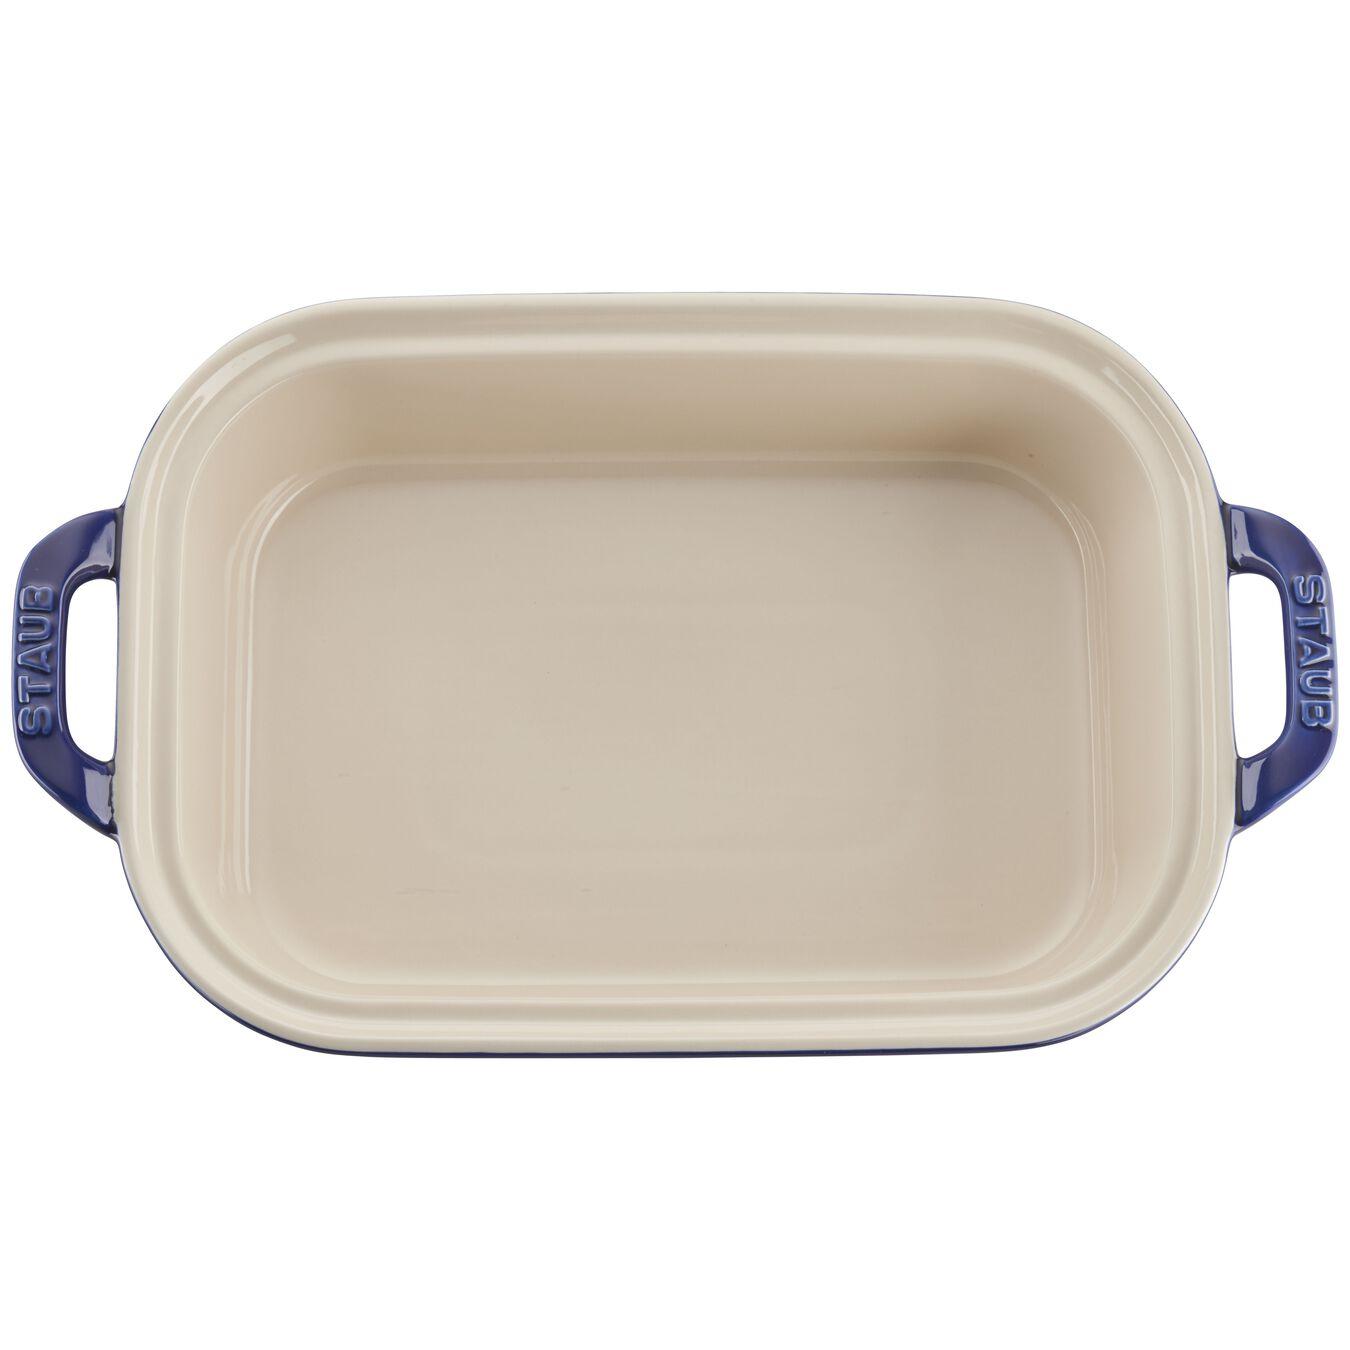 Ceramic rectangular Moules de forme spéciale, Dark-Blue,,large 4